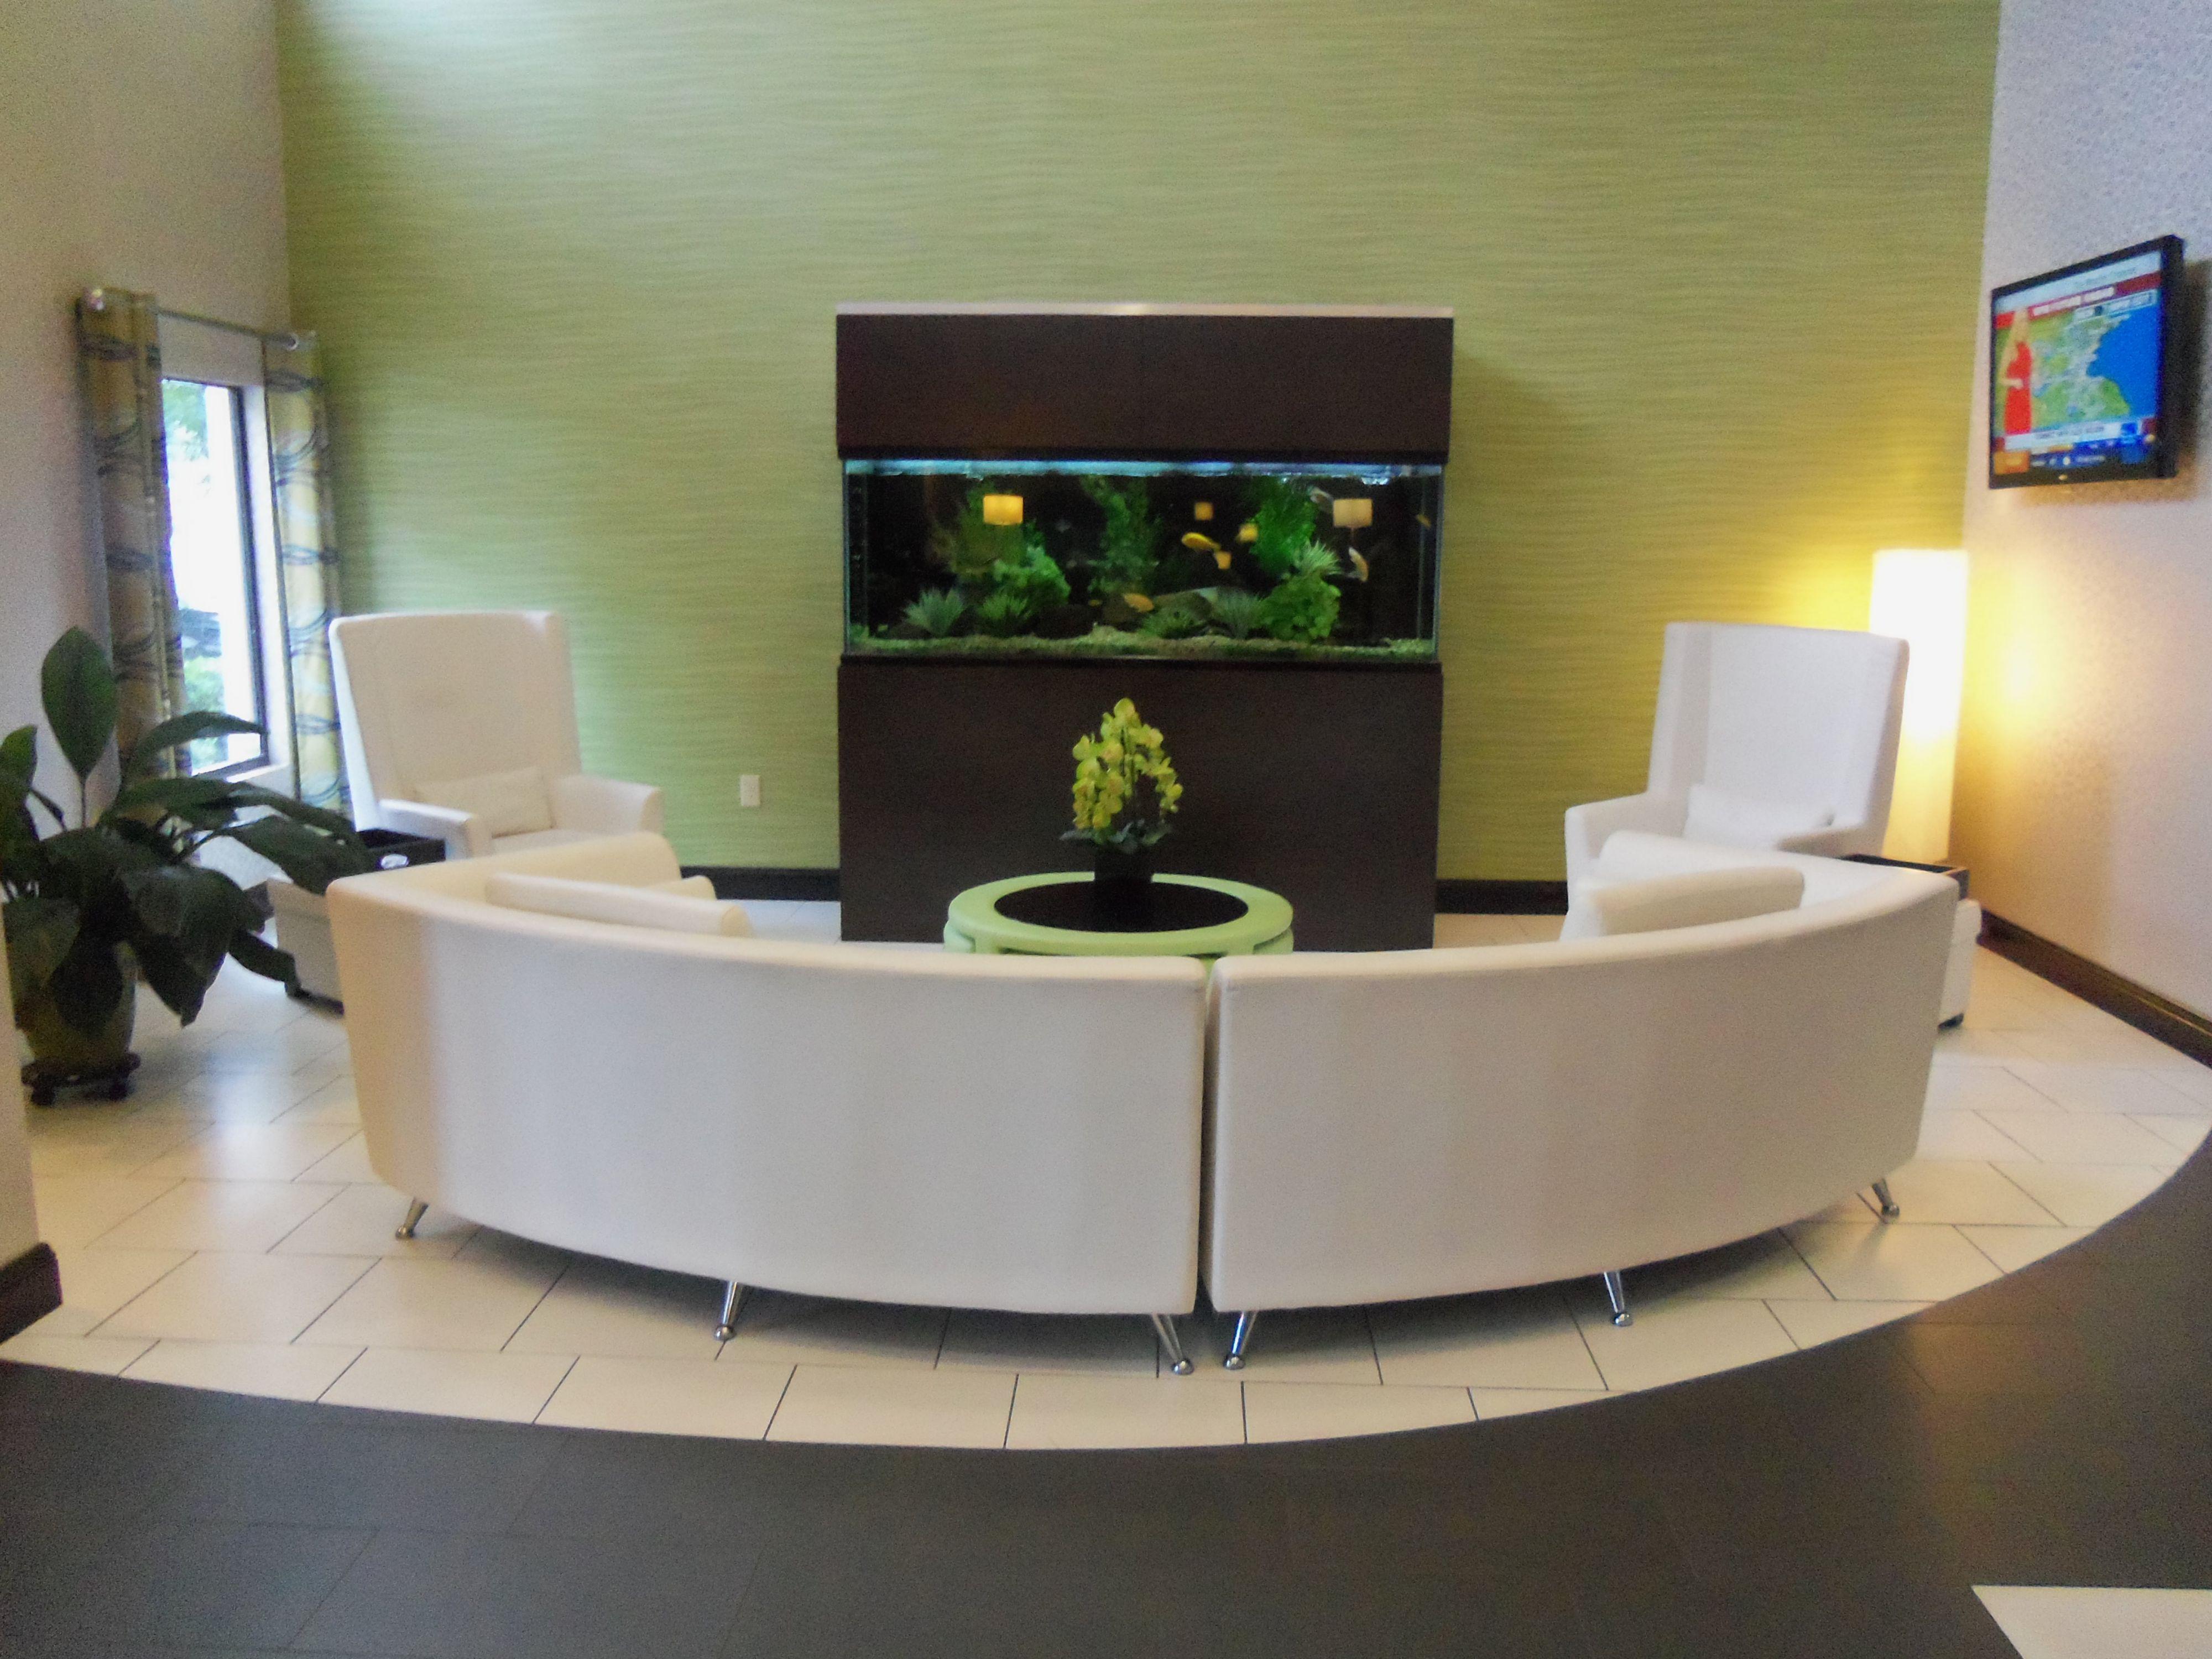 Holiday Inn Express & Suites Sanford image 4